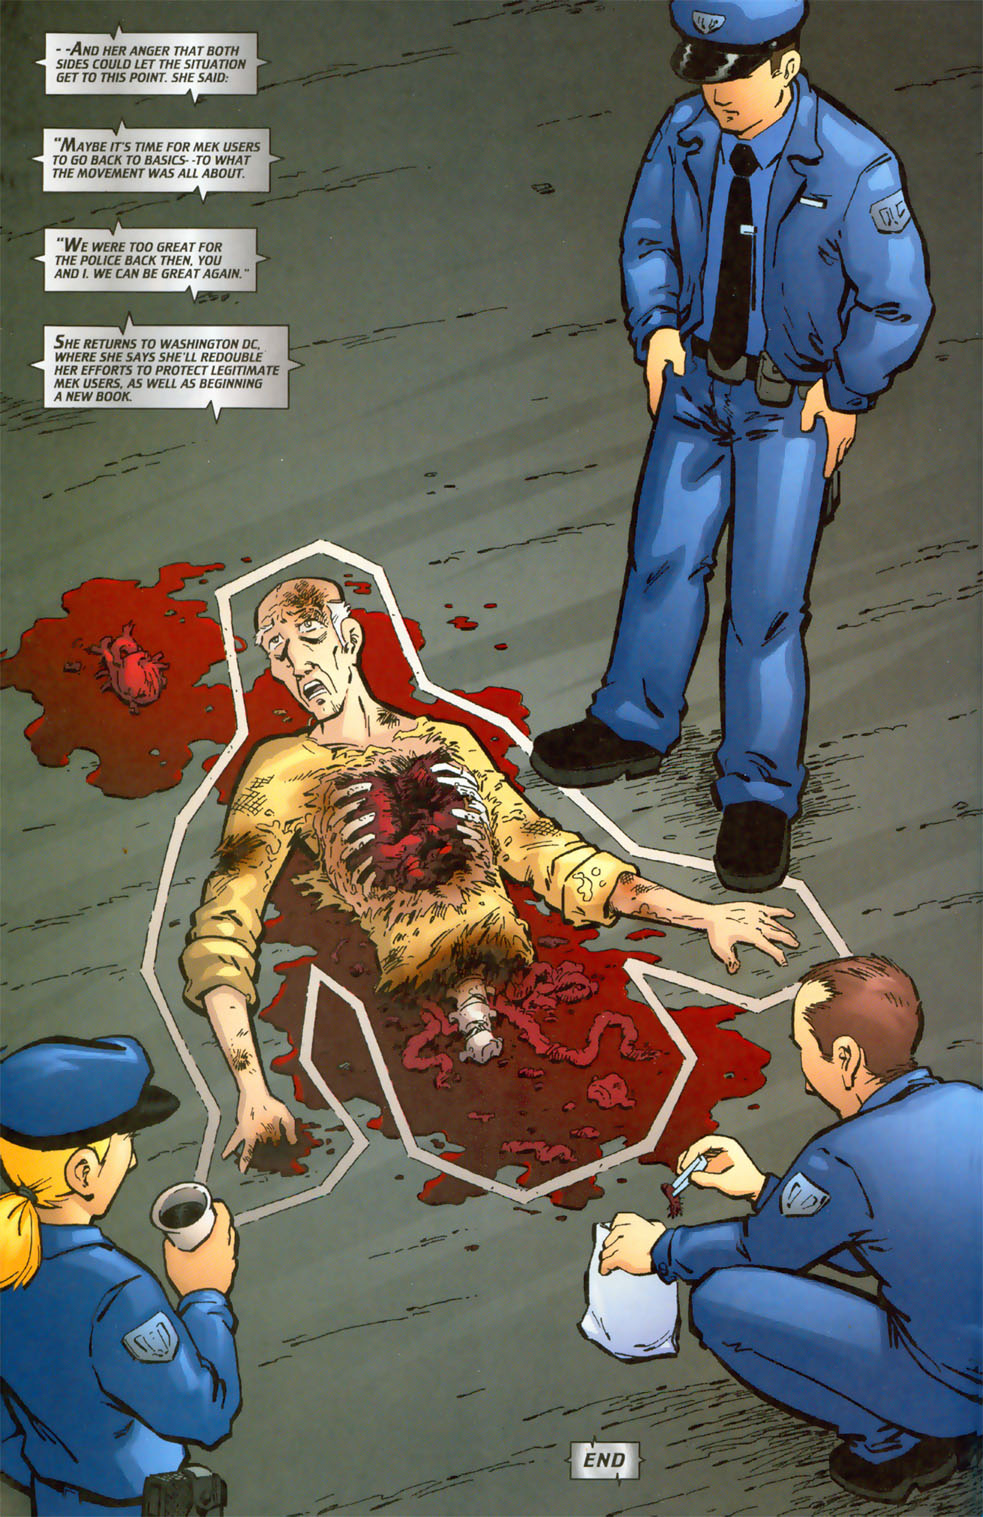 Read online Mek comic -  Issue #3 - 26